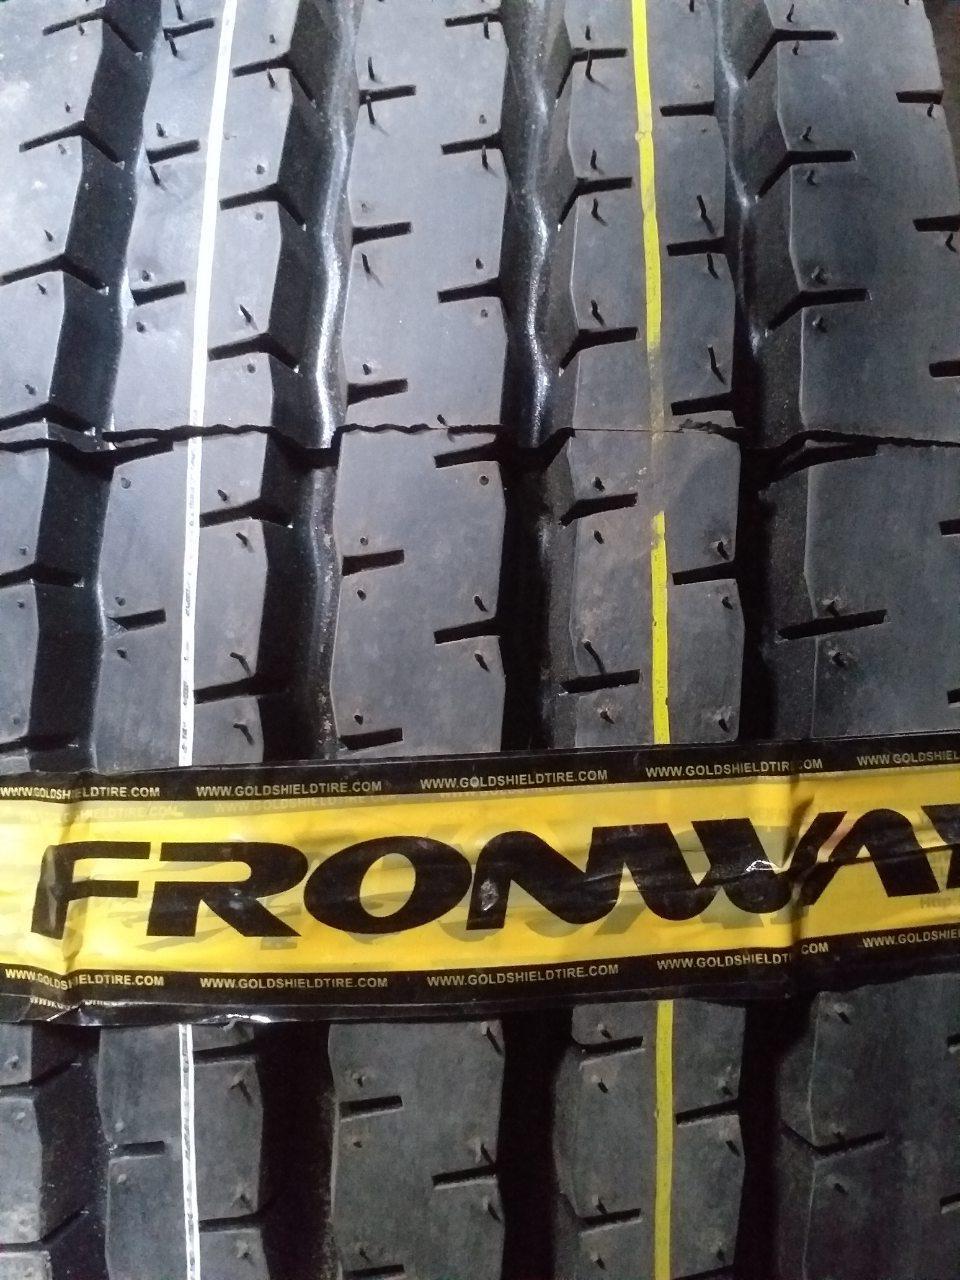 Грузовая шина Fronway HD 202 (Универсальная) 11.00R20